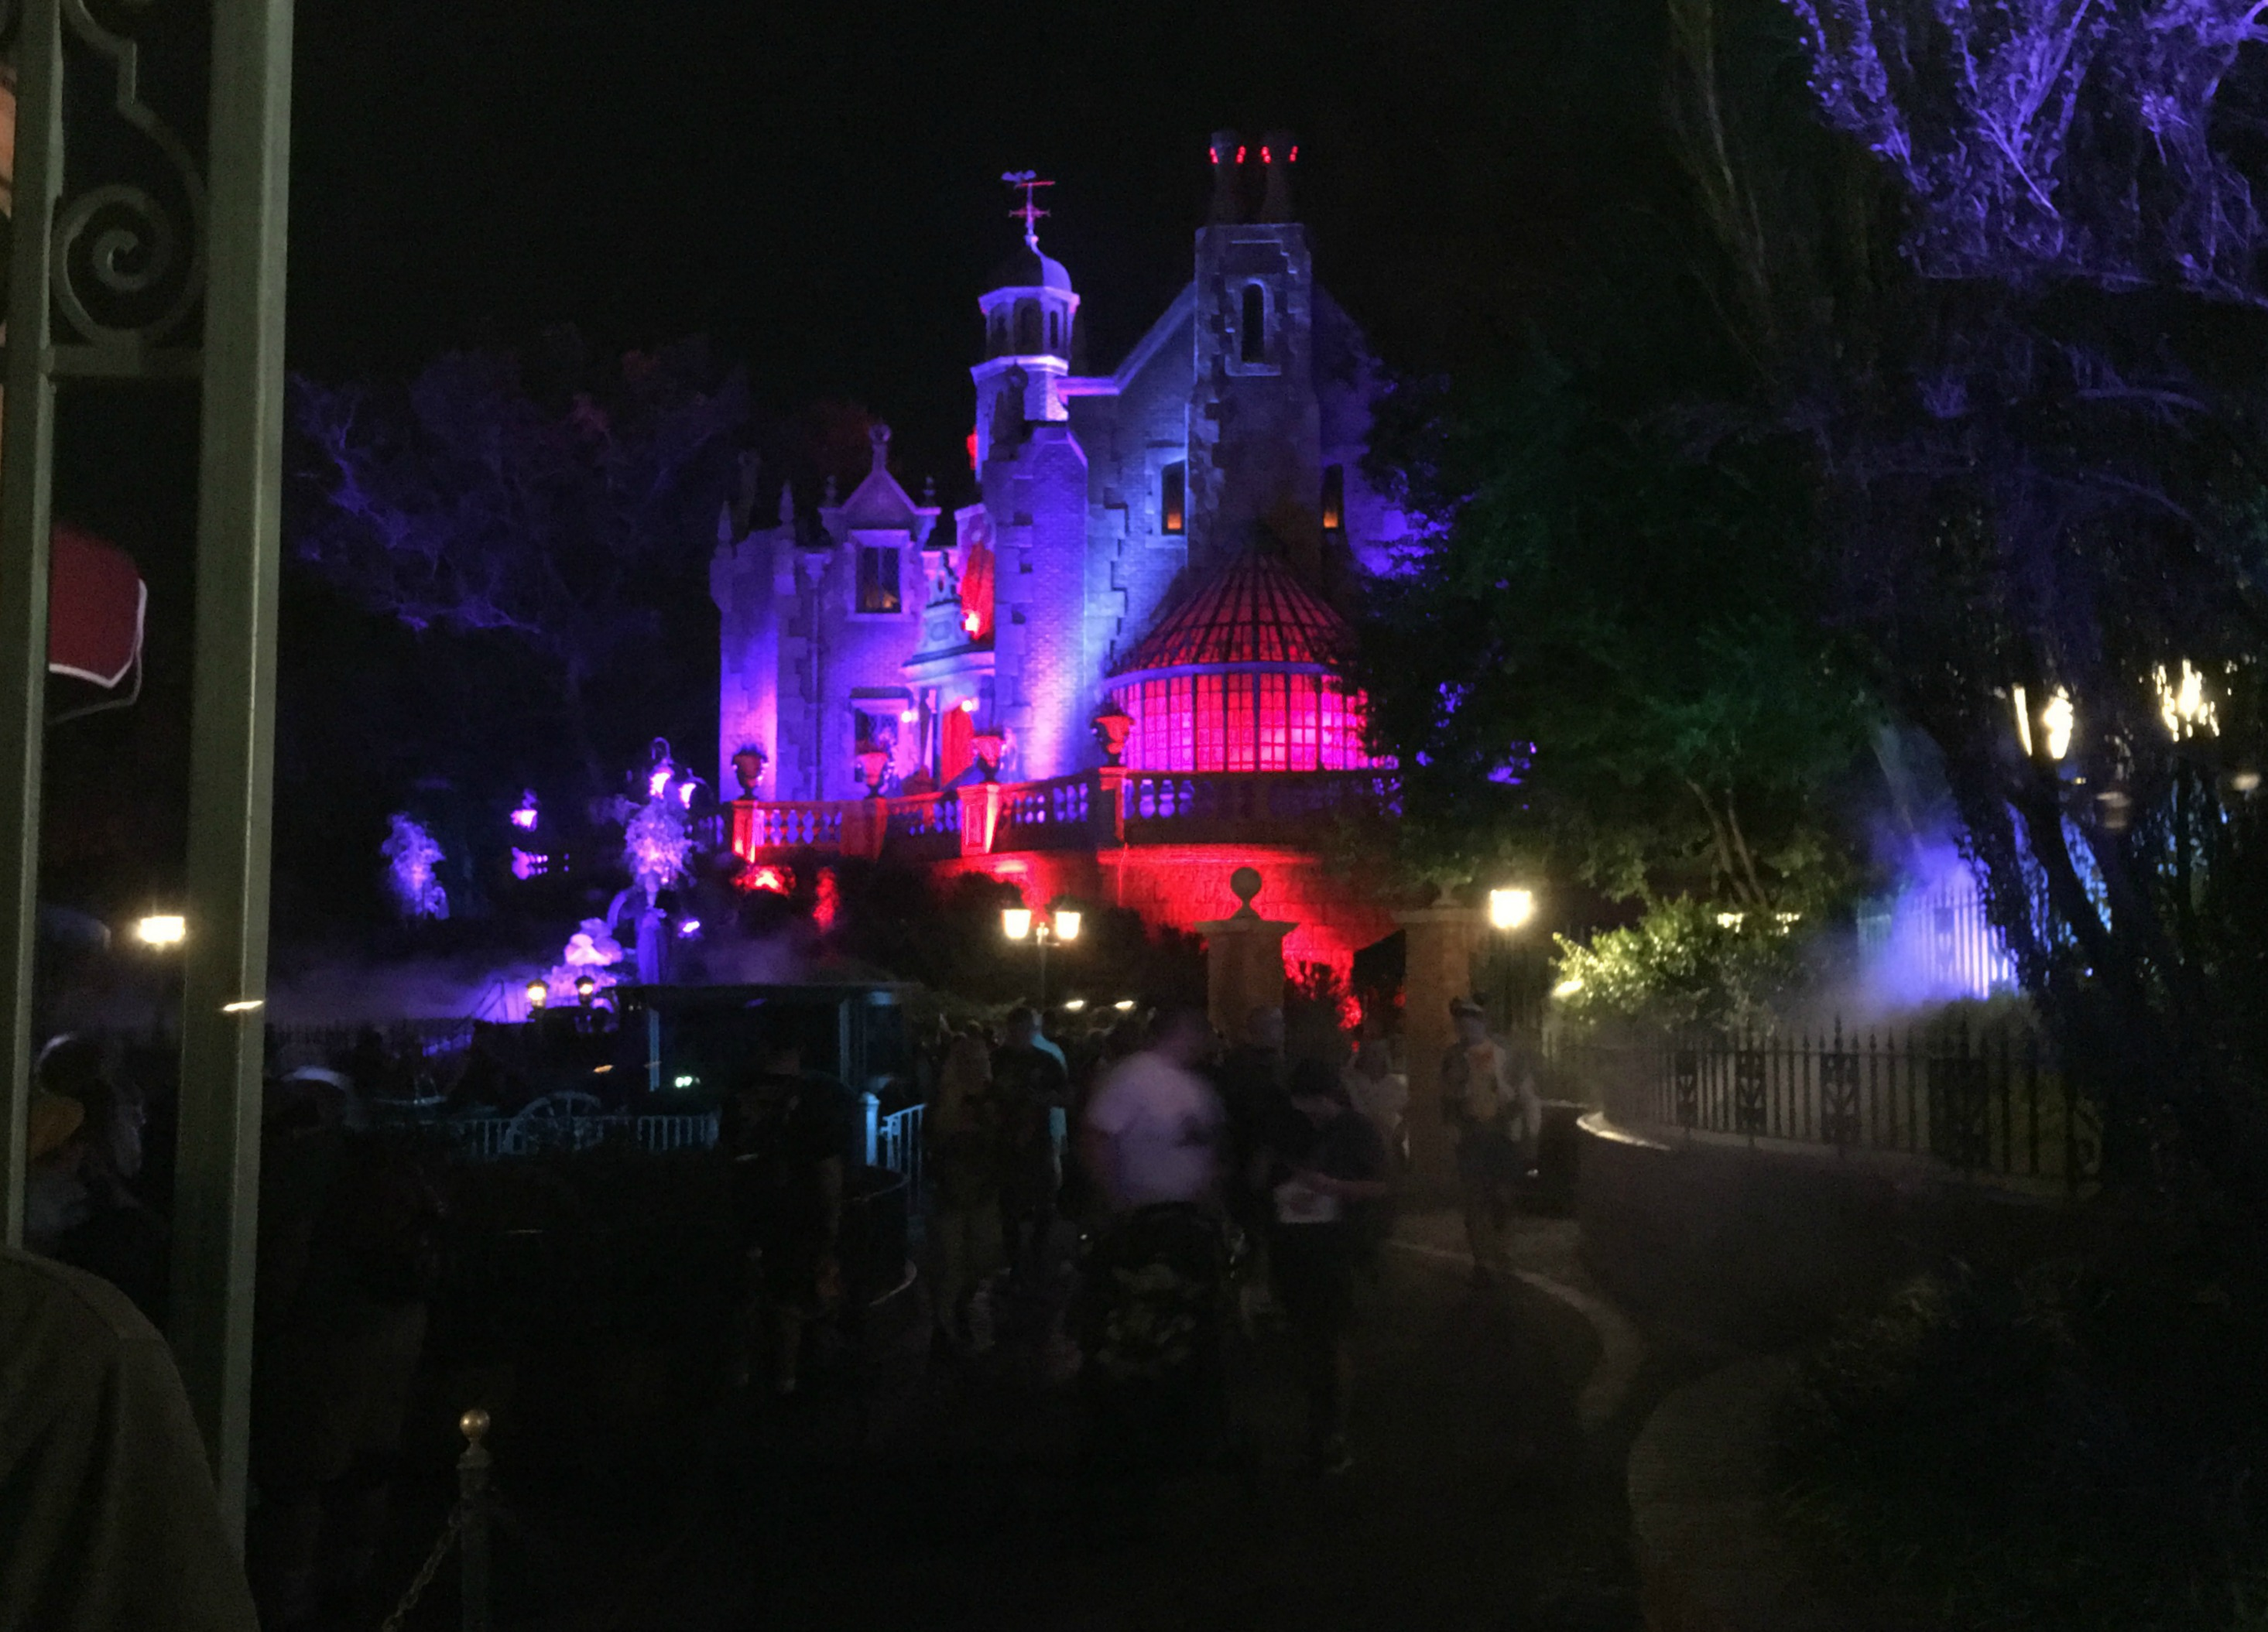 Haunted Mansion on Halloween